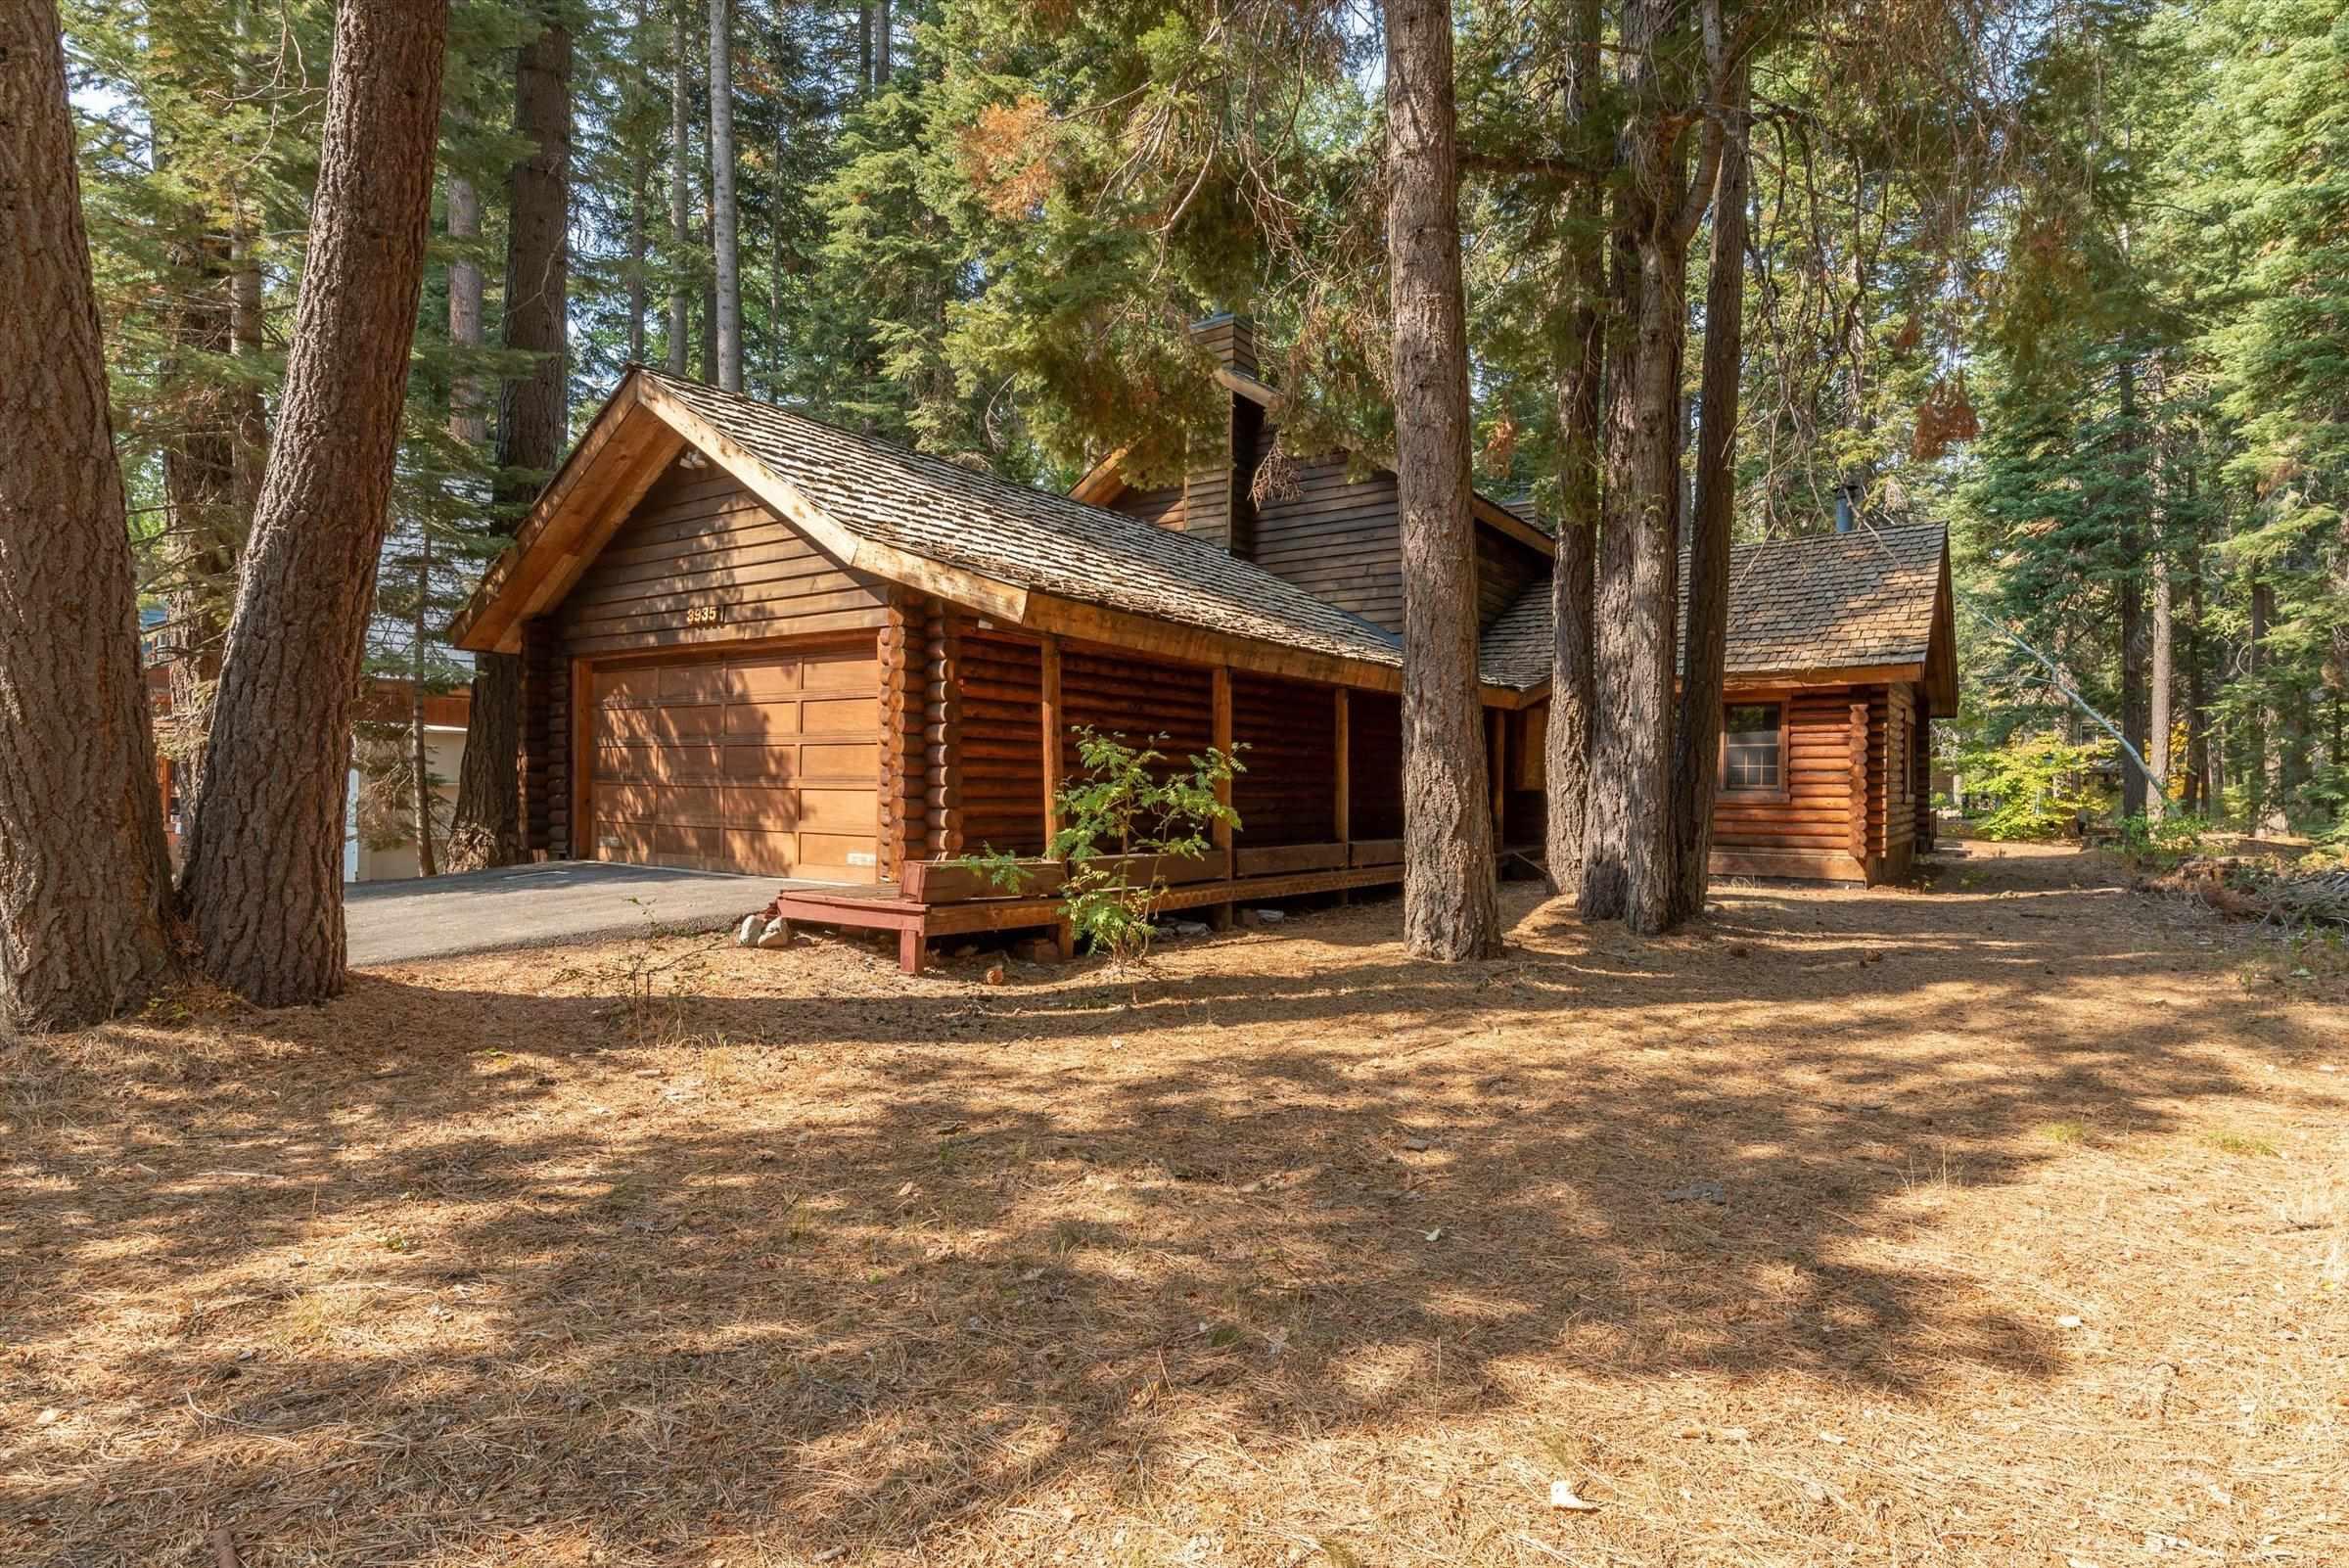 Image for 3935 West Lake Boulevard, Homewood, CA 96141